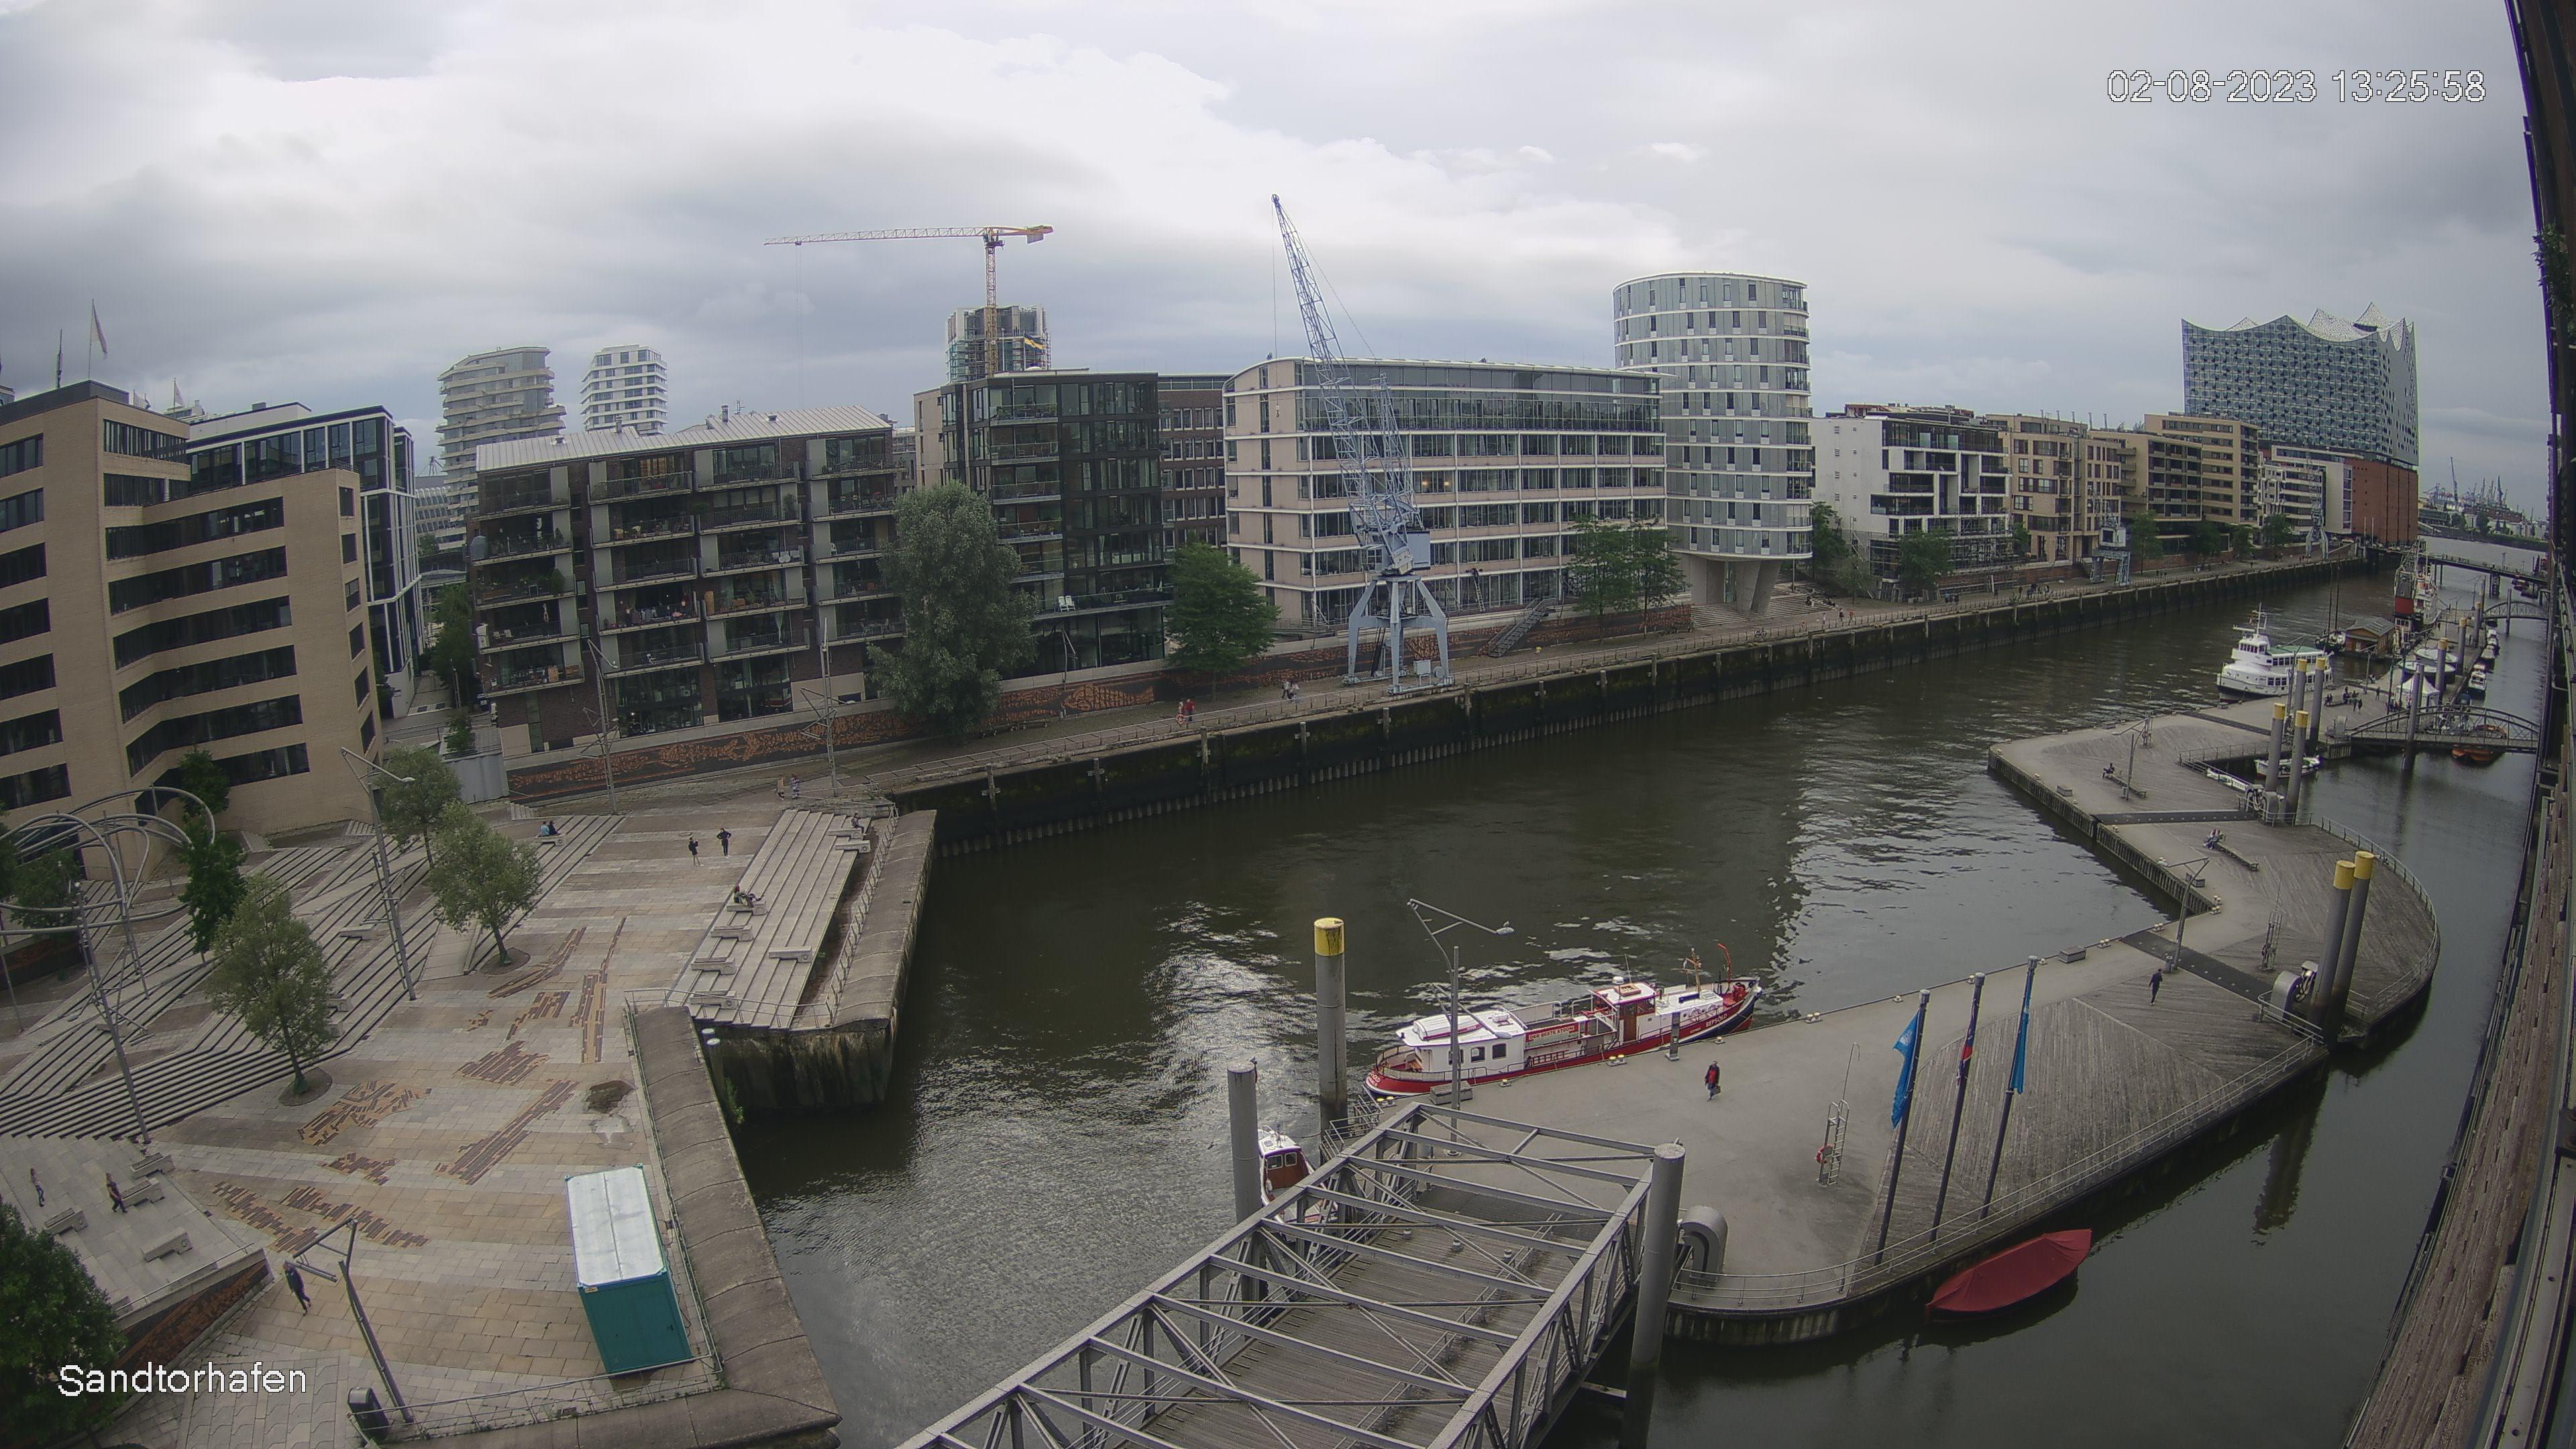 Hamburg Sandtorhafen